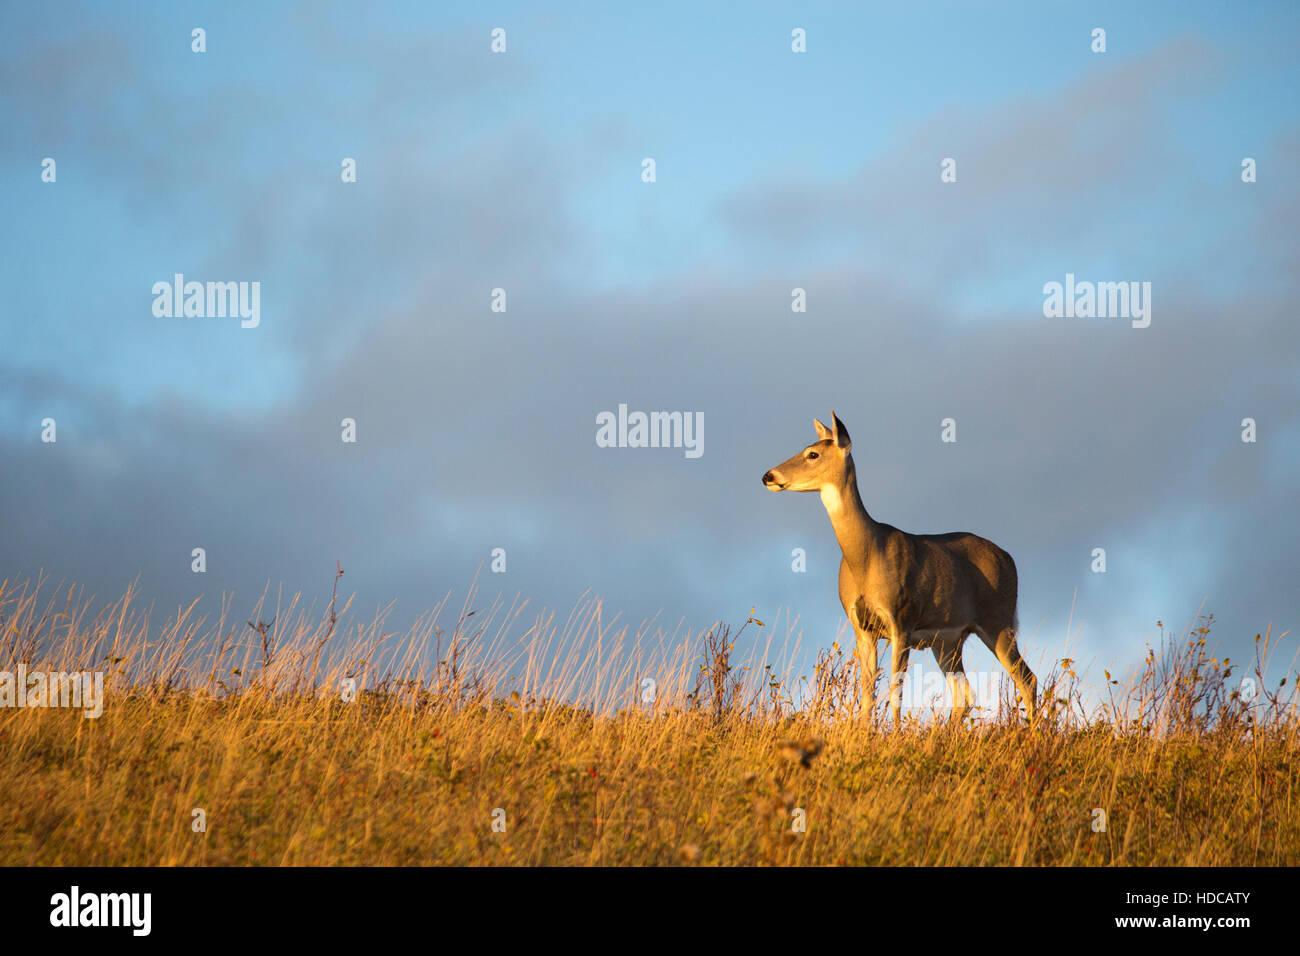 White-tailed Deer doe (Odocoileus virginianus) in Nose Hill park, city of Calgary. - Stock Image